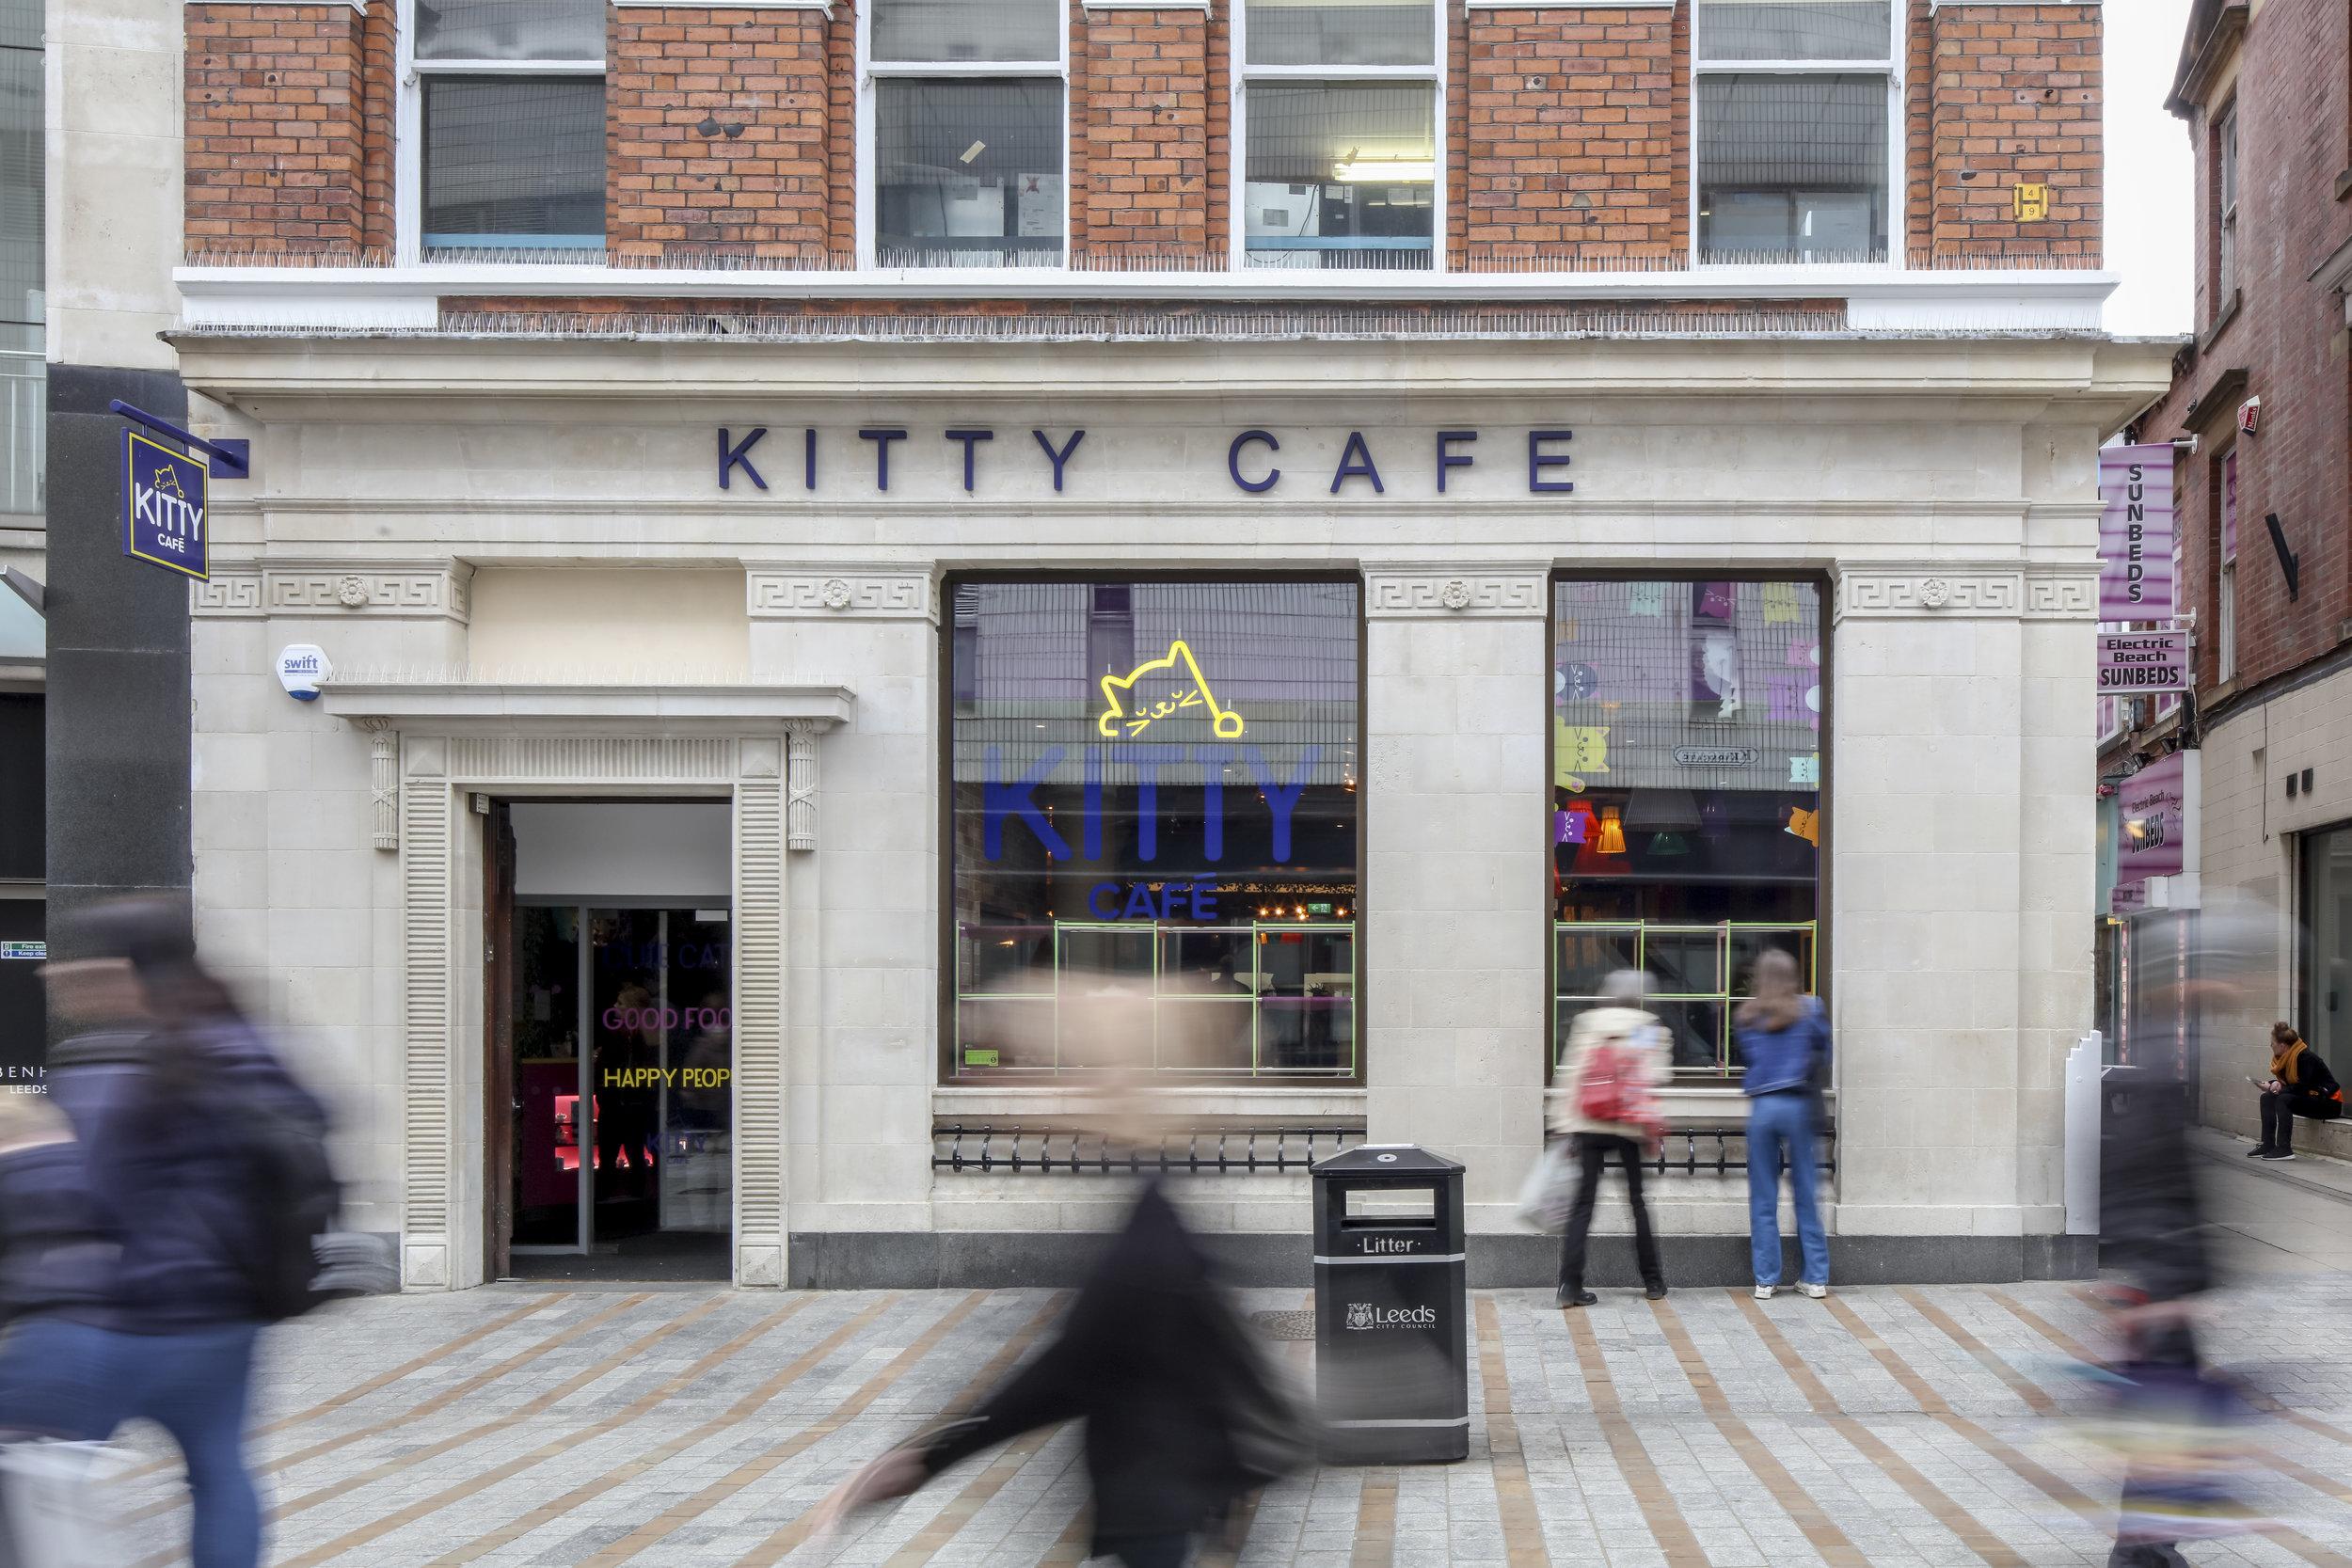 0029_KITTY CAFE LEEDS_CPMG20180424_NH1_0029.JPG